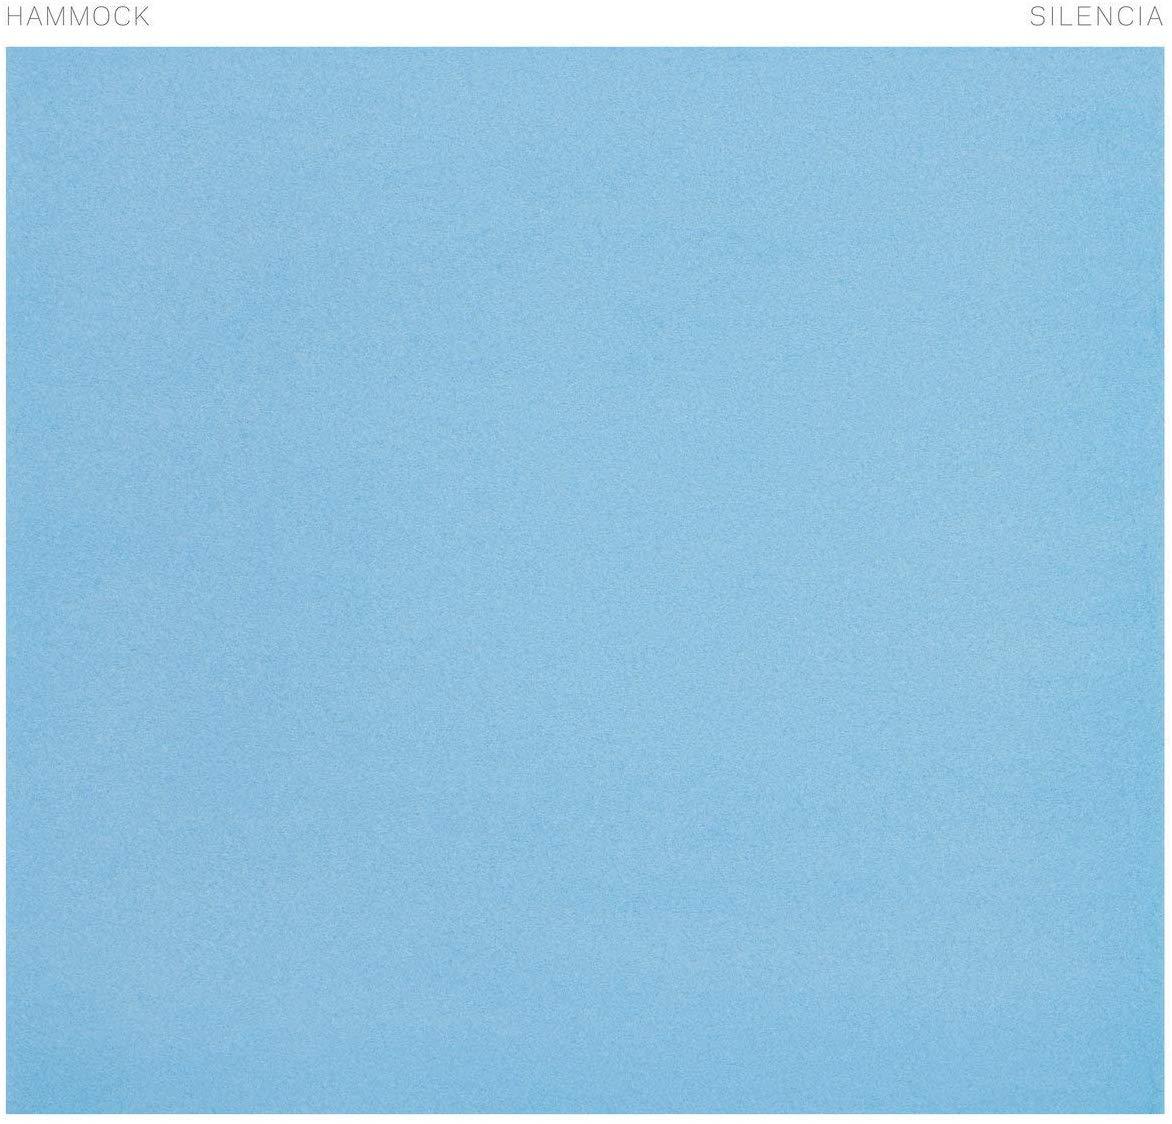 HAMMOCK - SILENCIA (CD)